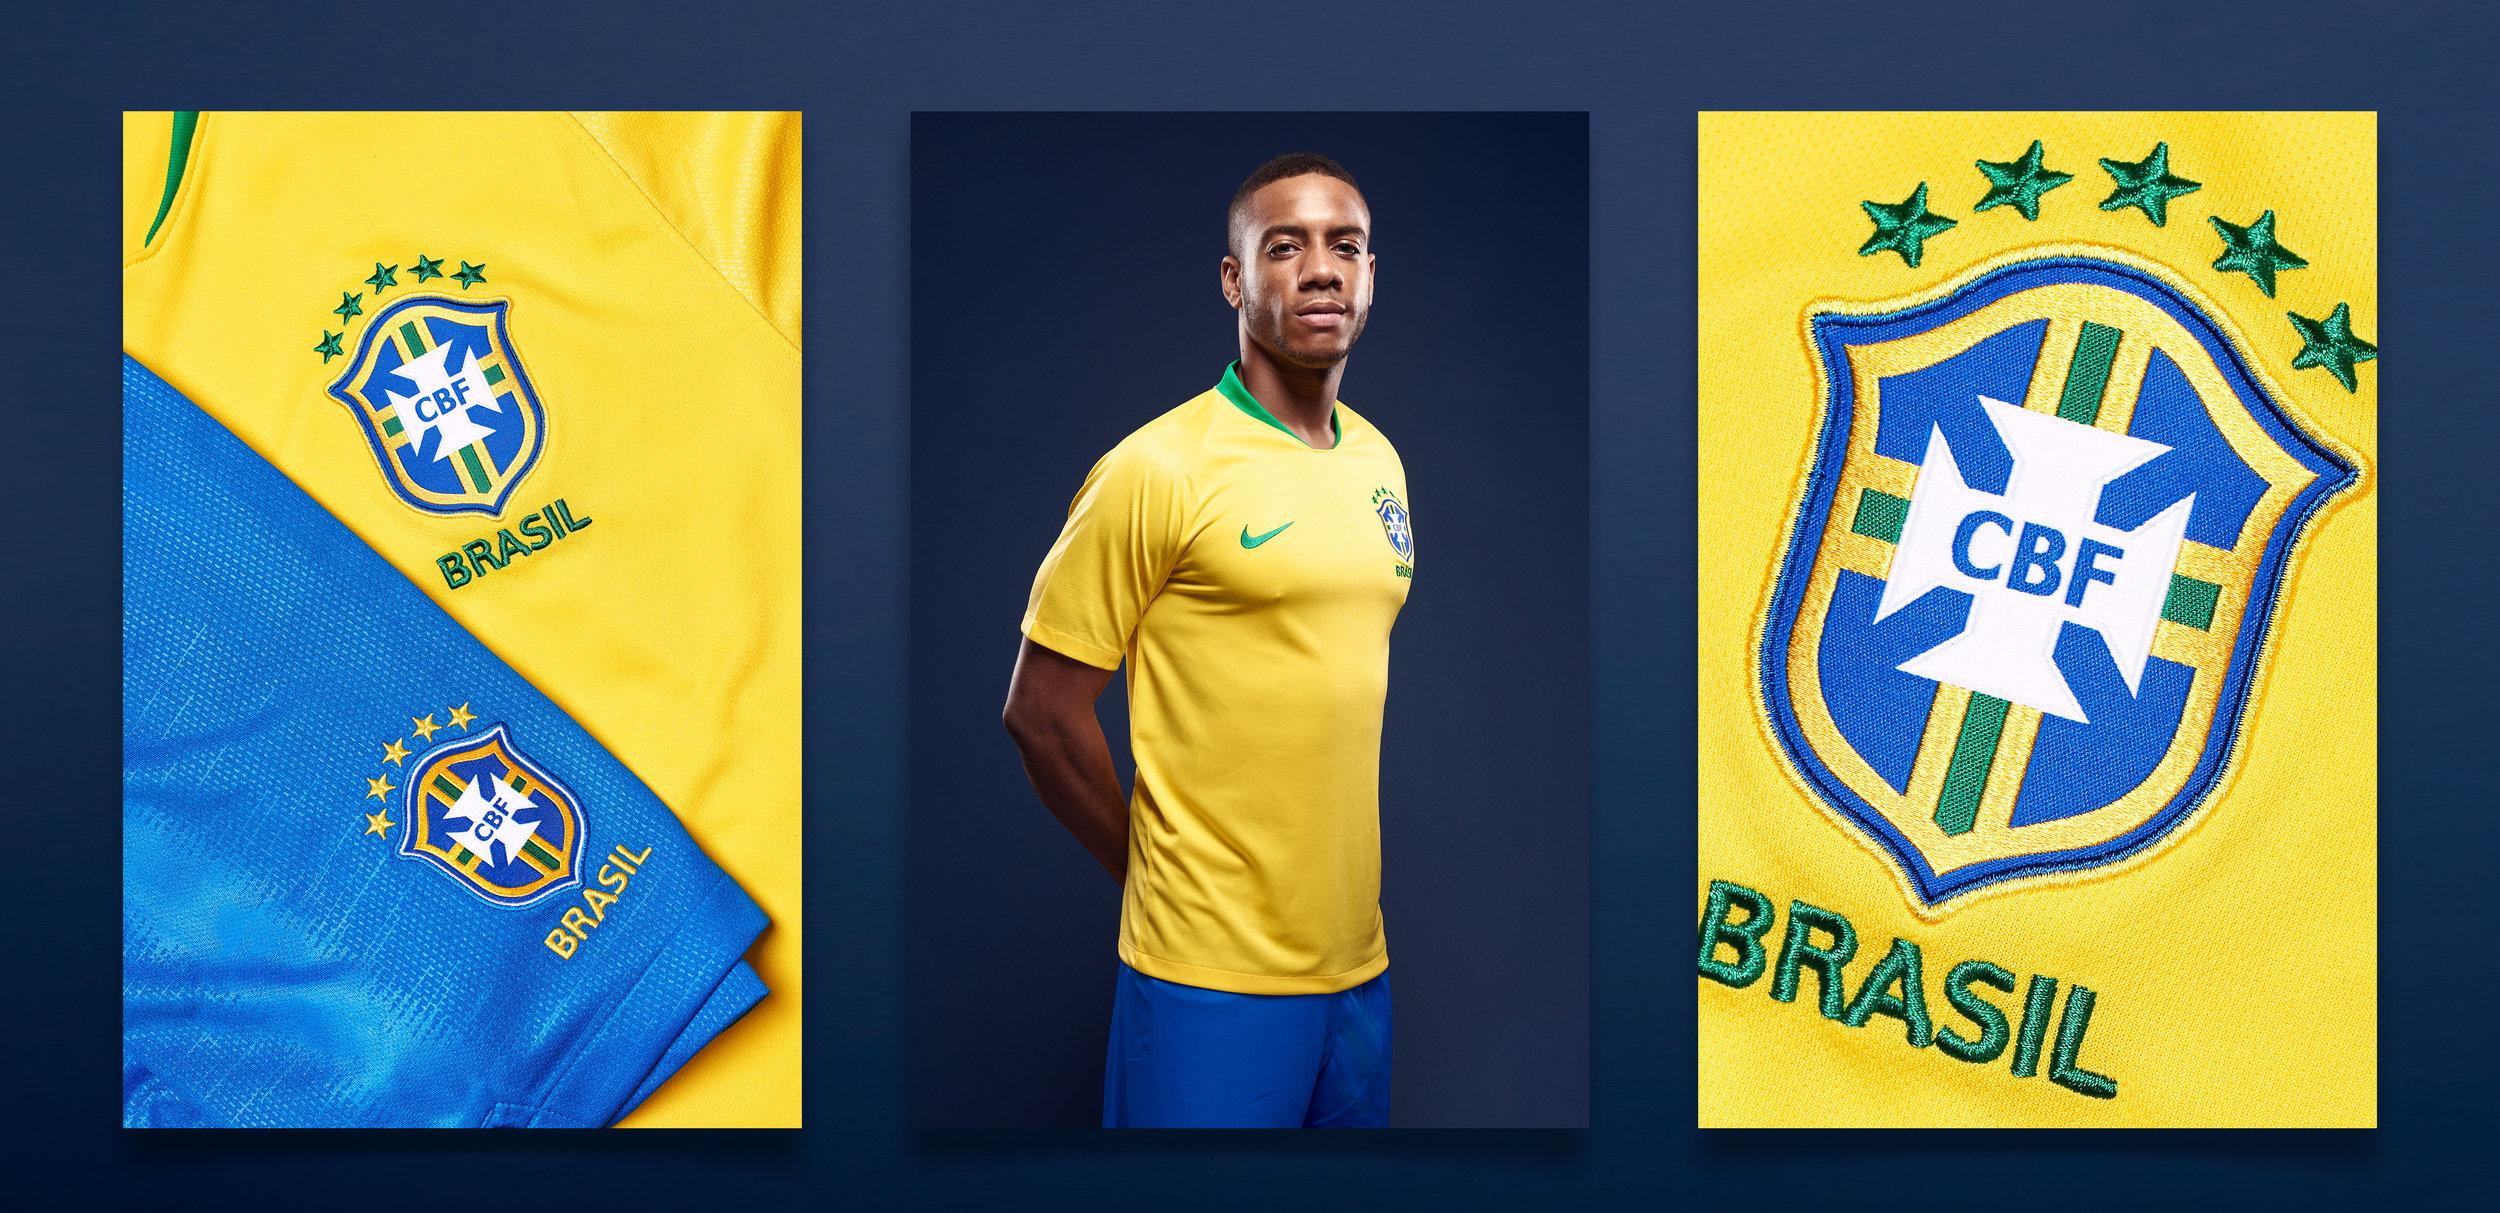 Nike-World-Cup-2018-Photoshoot-England-France-Brazil-Photos-taken-by-Nick-Pecori-Photographer-Tampa-Orlando-Florida-25.jpg